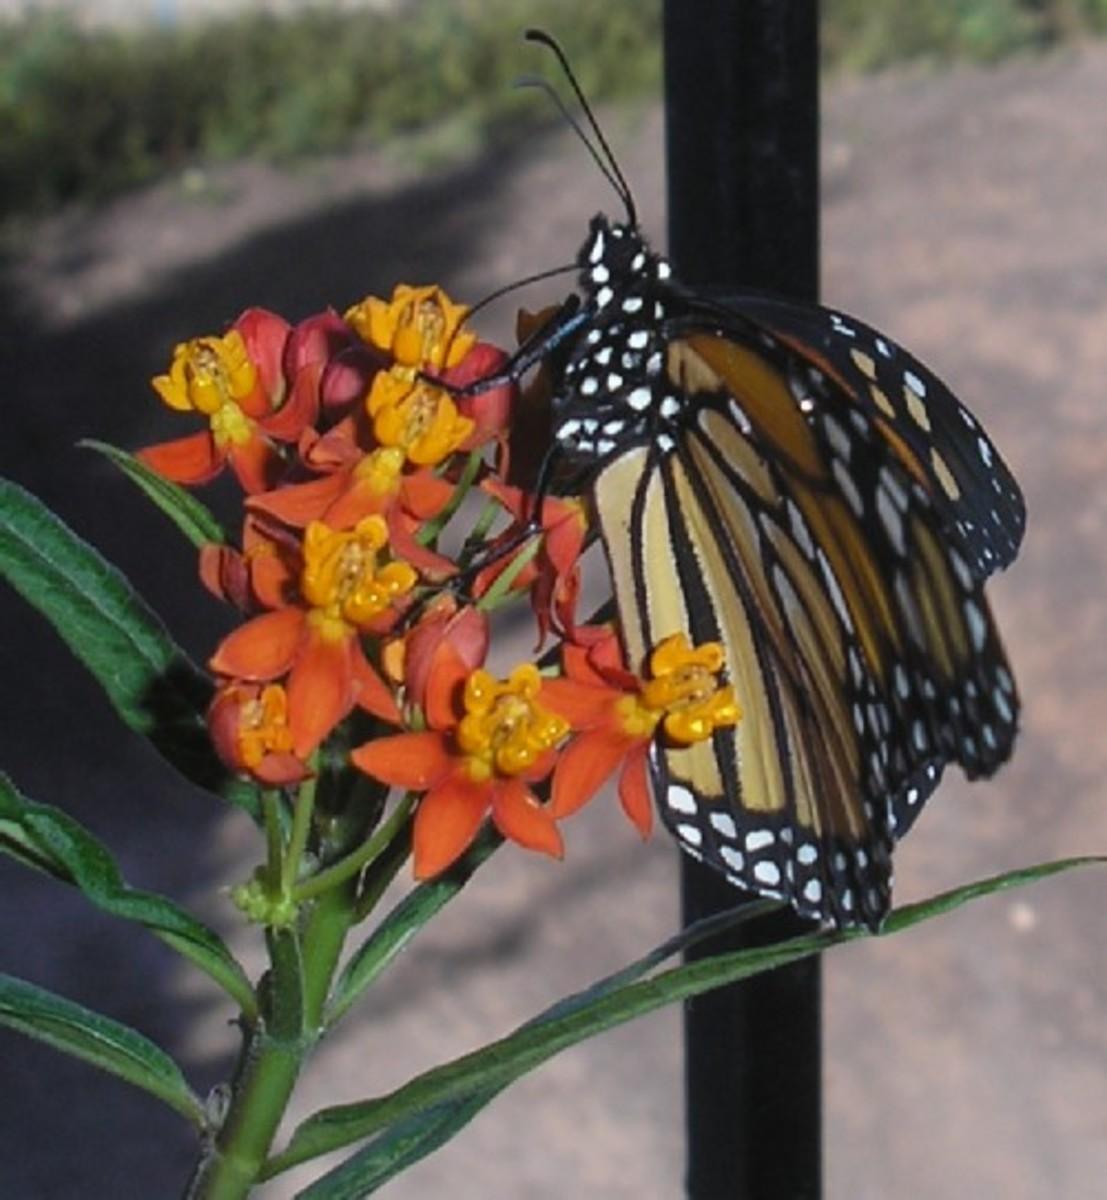 Monarch feeding on milkweed flower